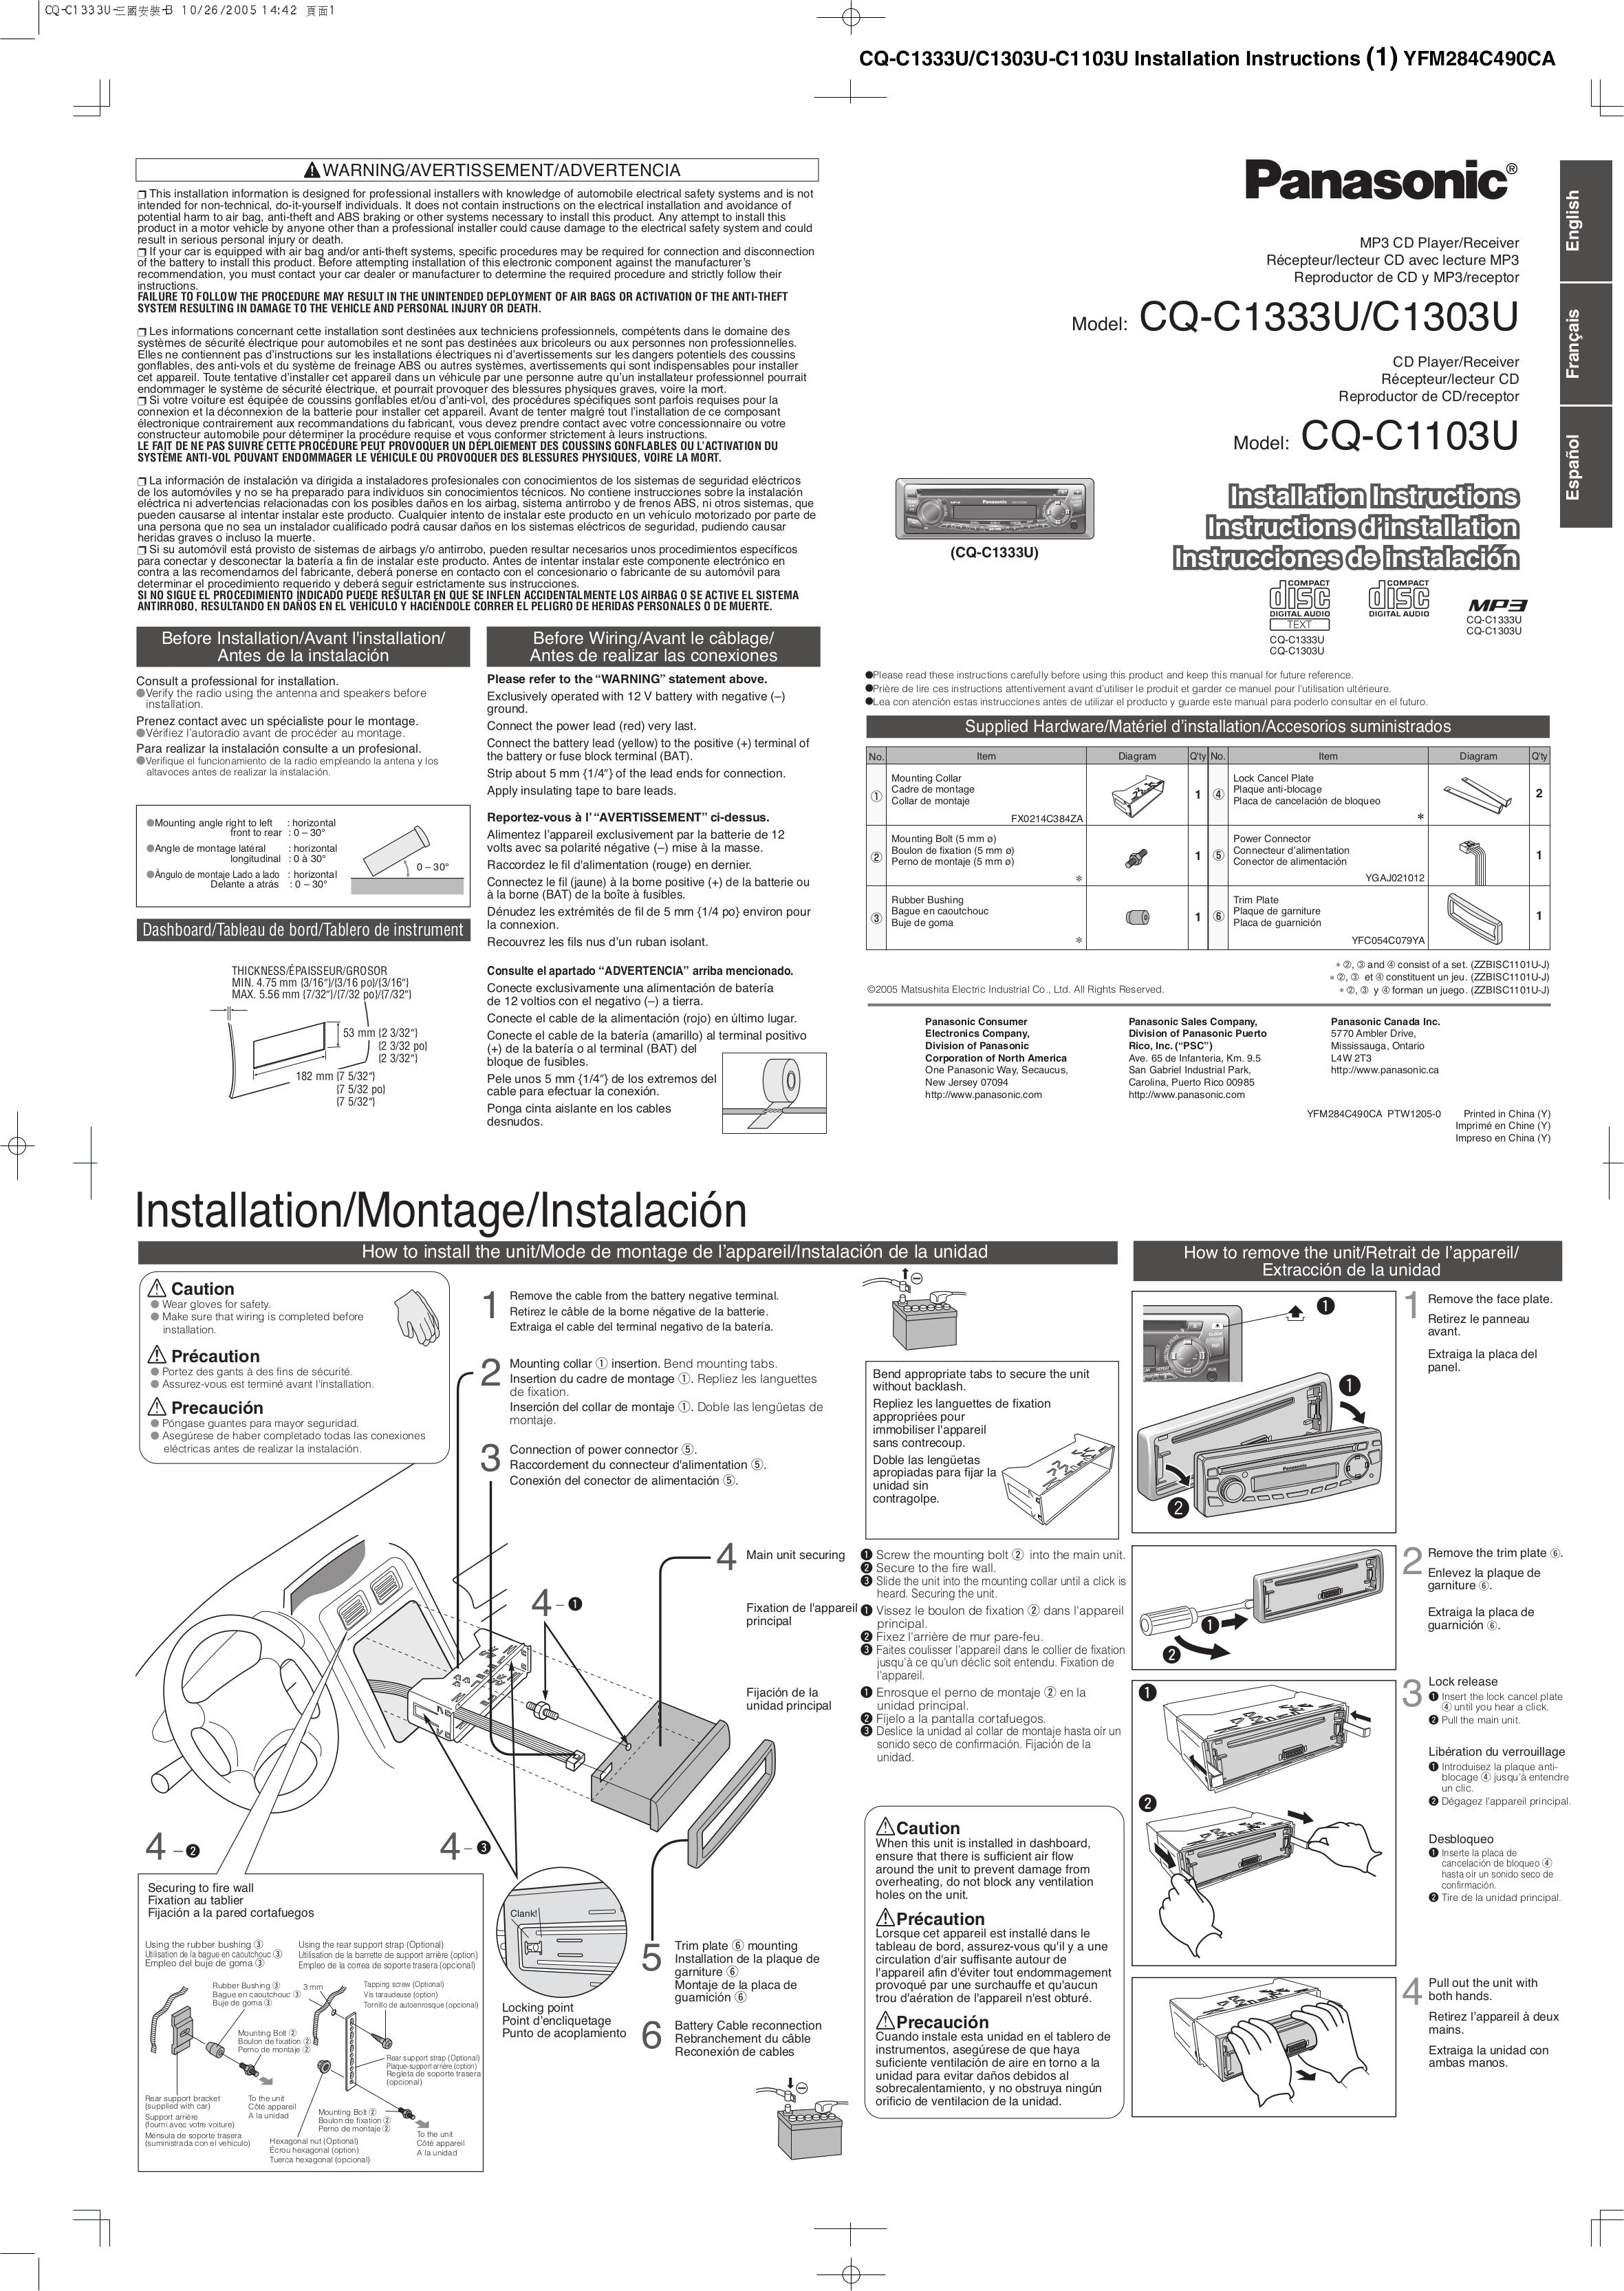 Panasonic Cq Vd7001U Wiring Diagram from schematron.org